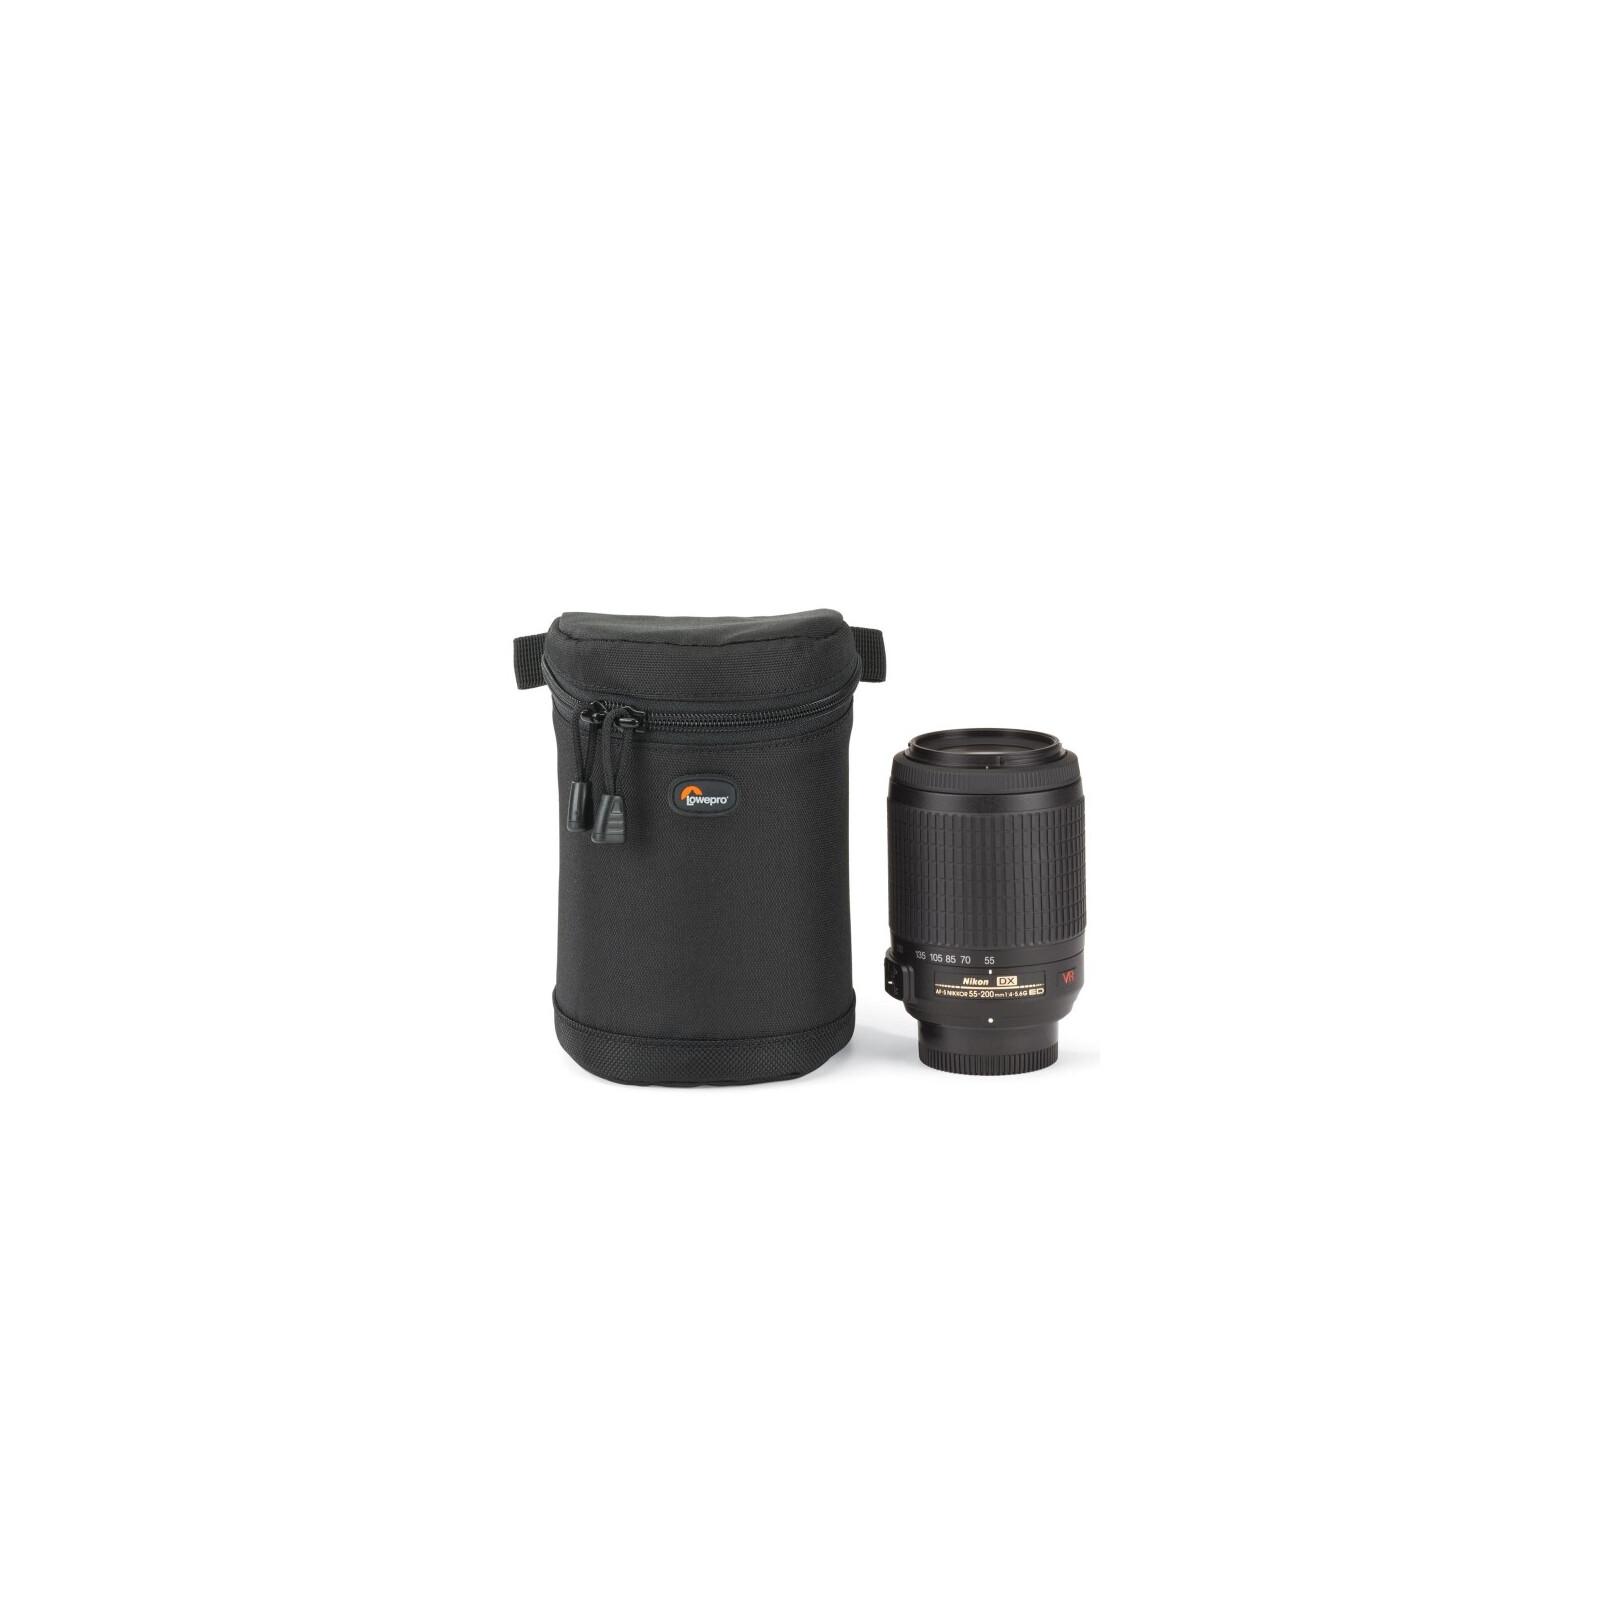 Lowepro 9x13 Lens Case